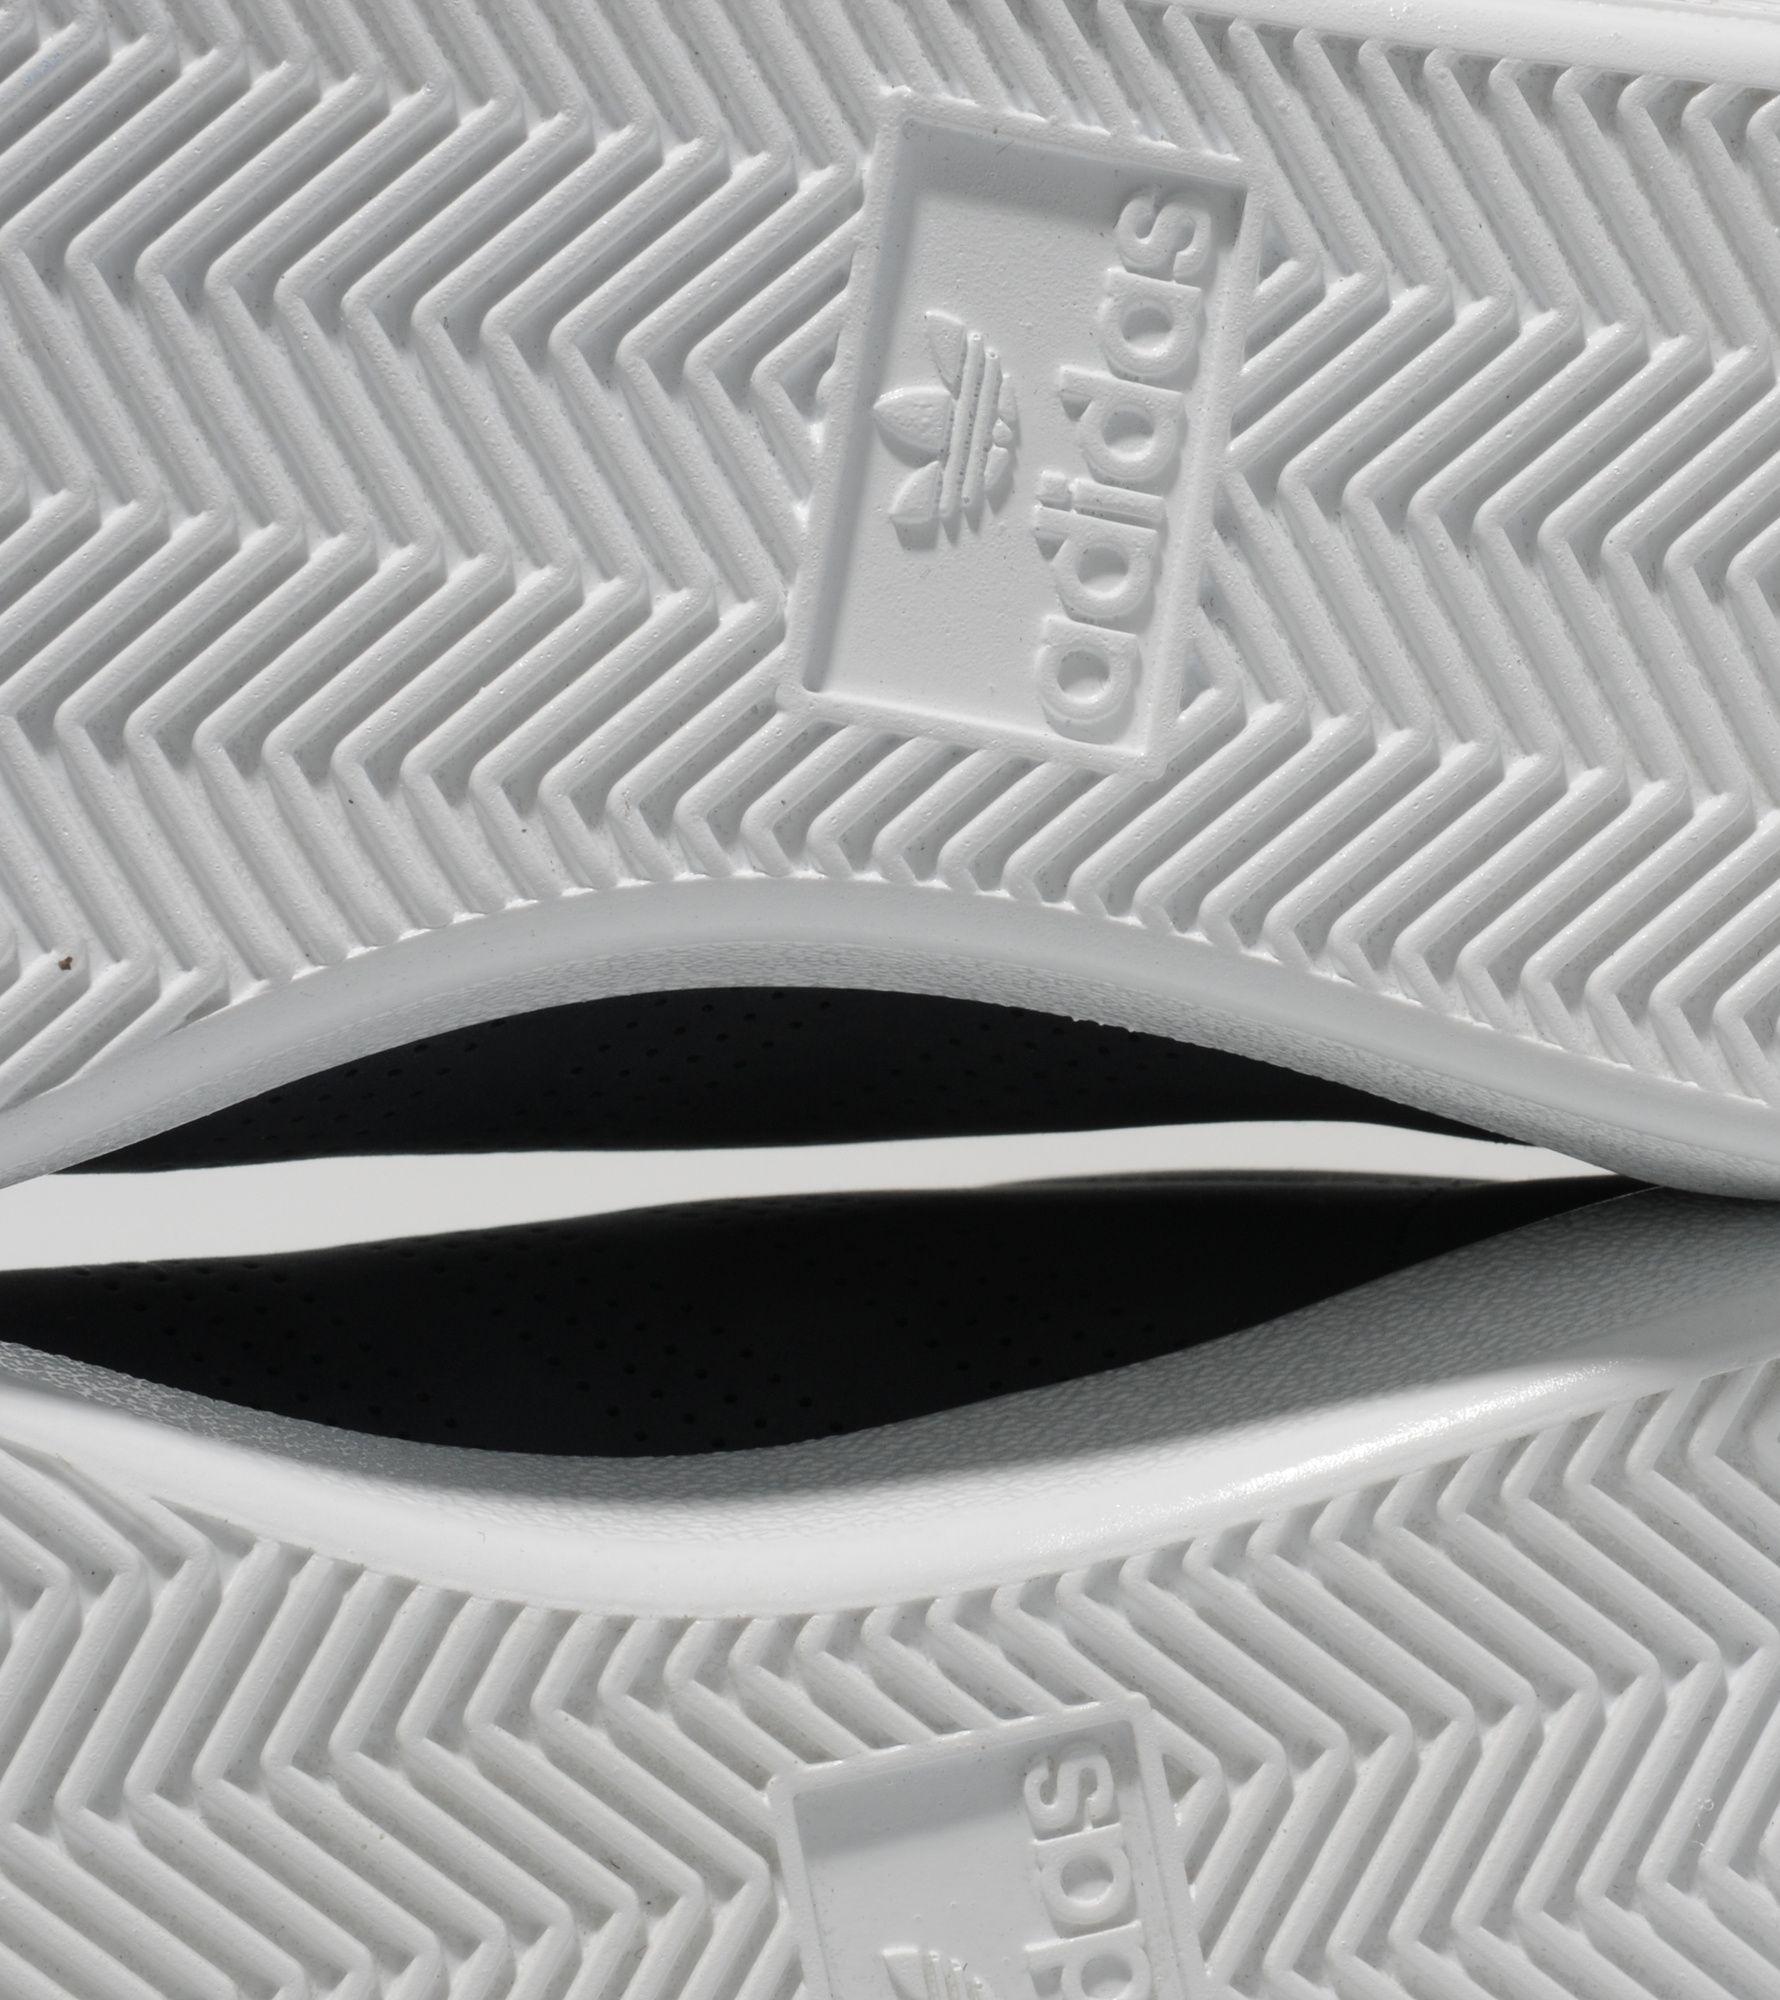 ¿Adidas Originals obyo x David Beckham Forest Hill mediados de tamaño?